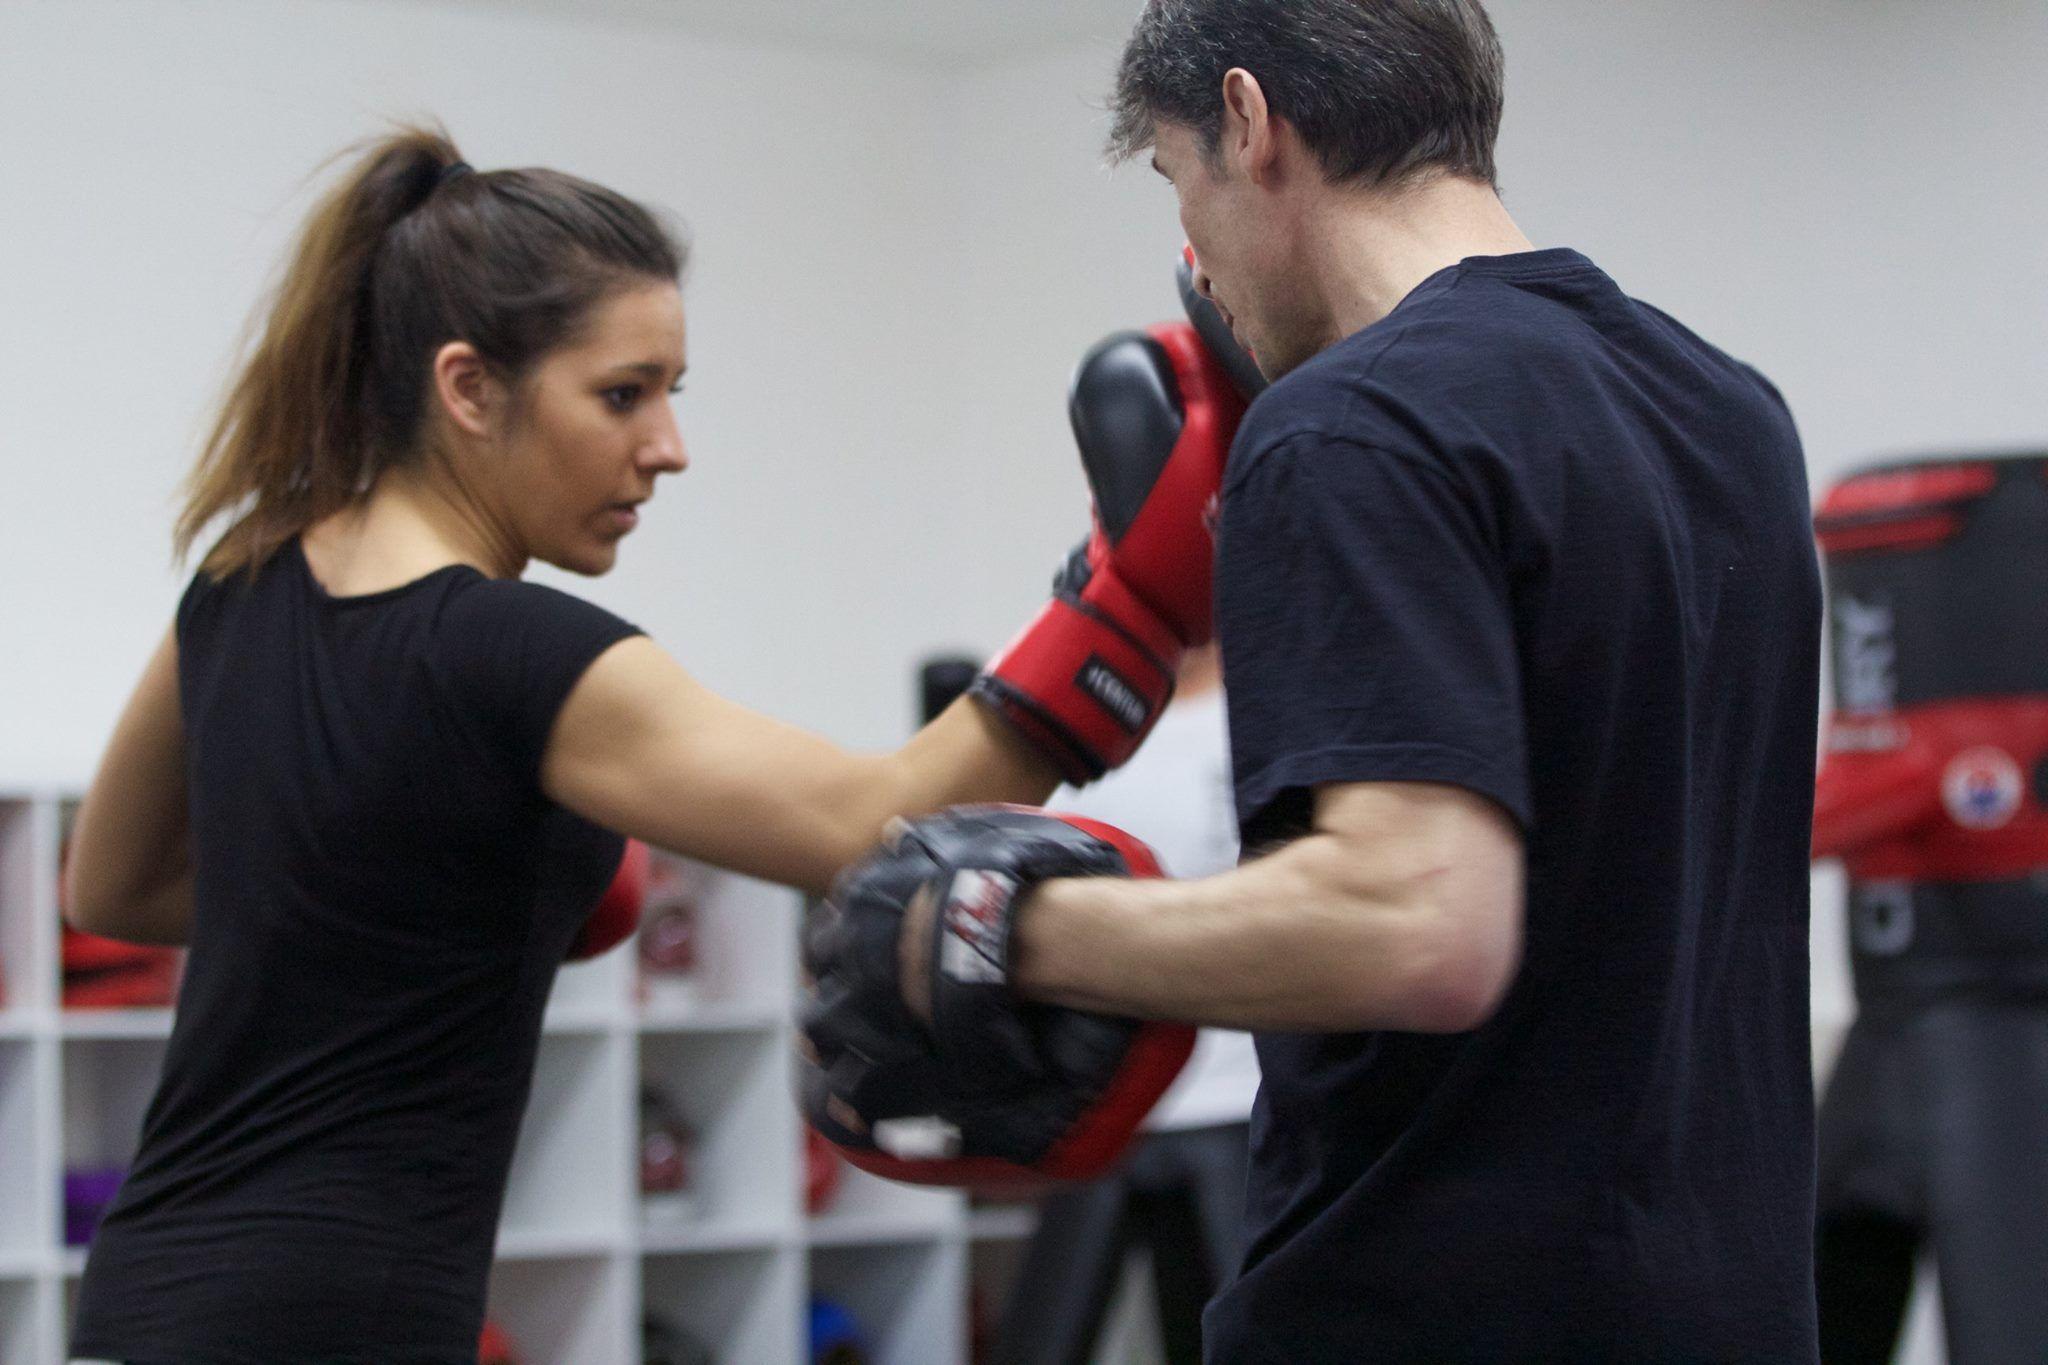 Martial Arts Center München